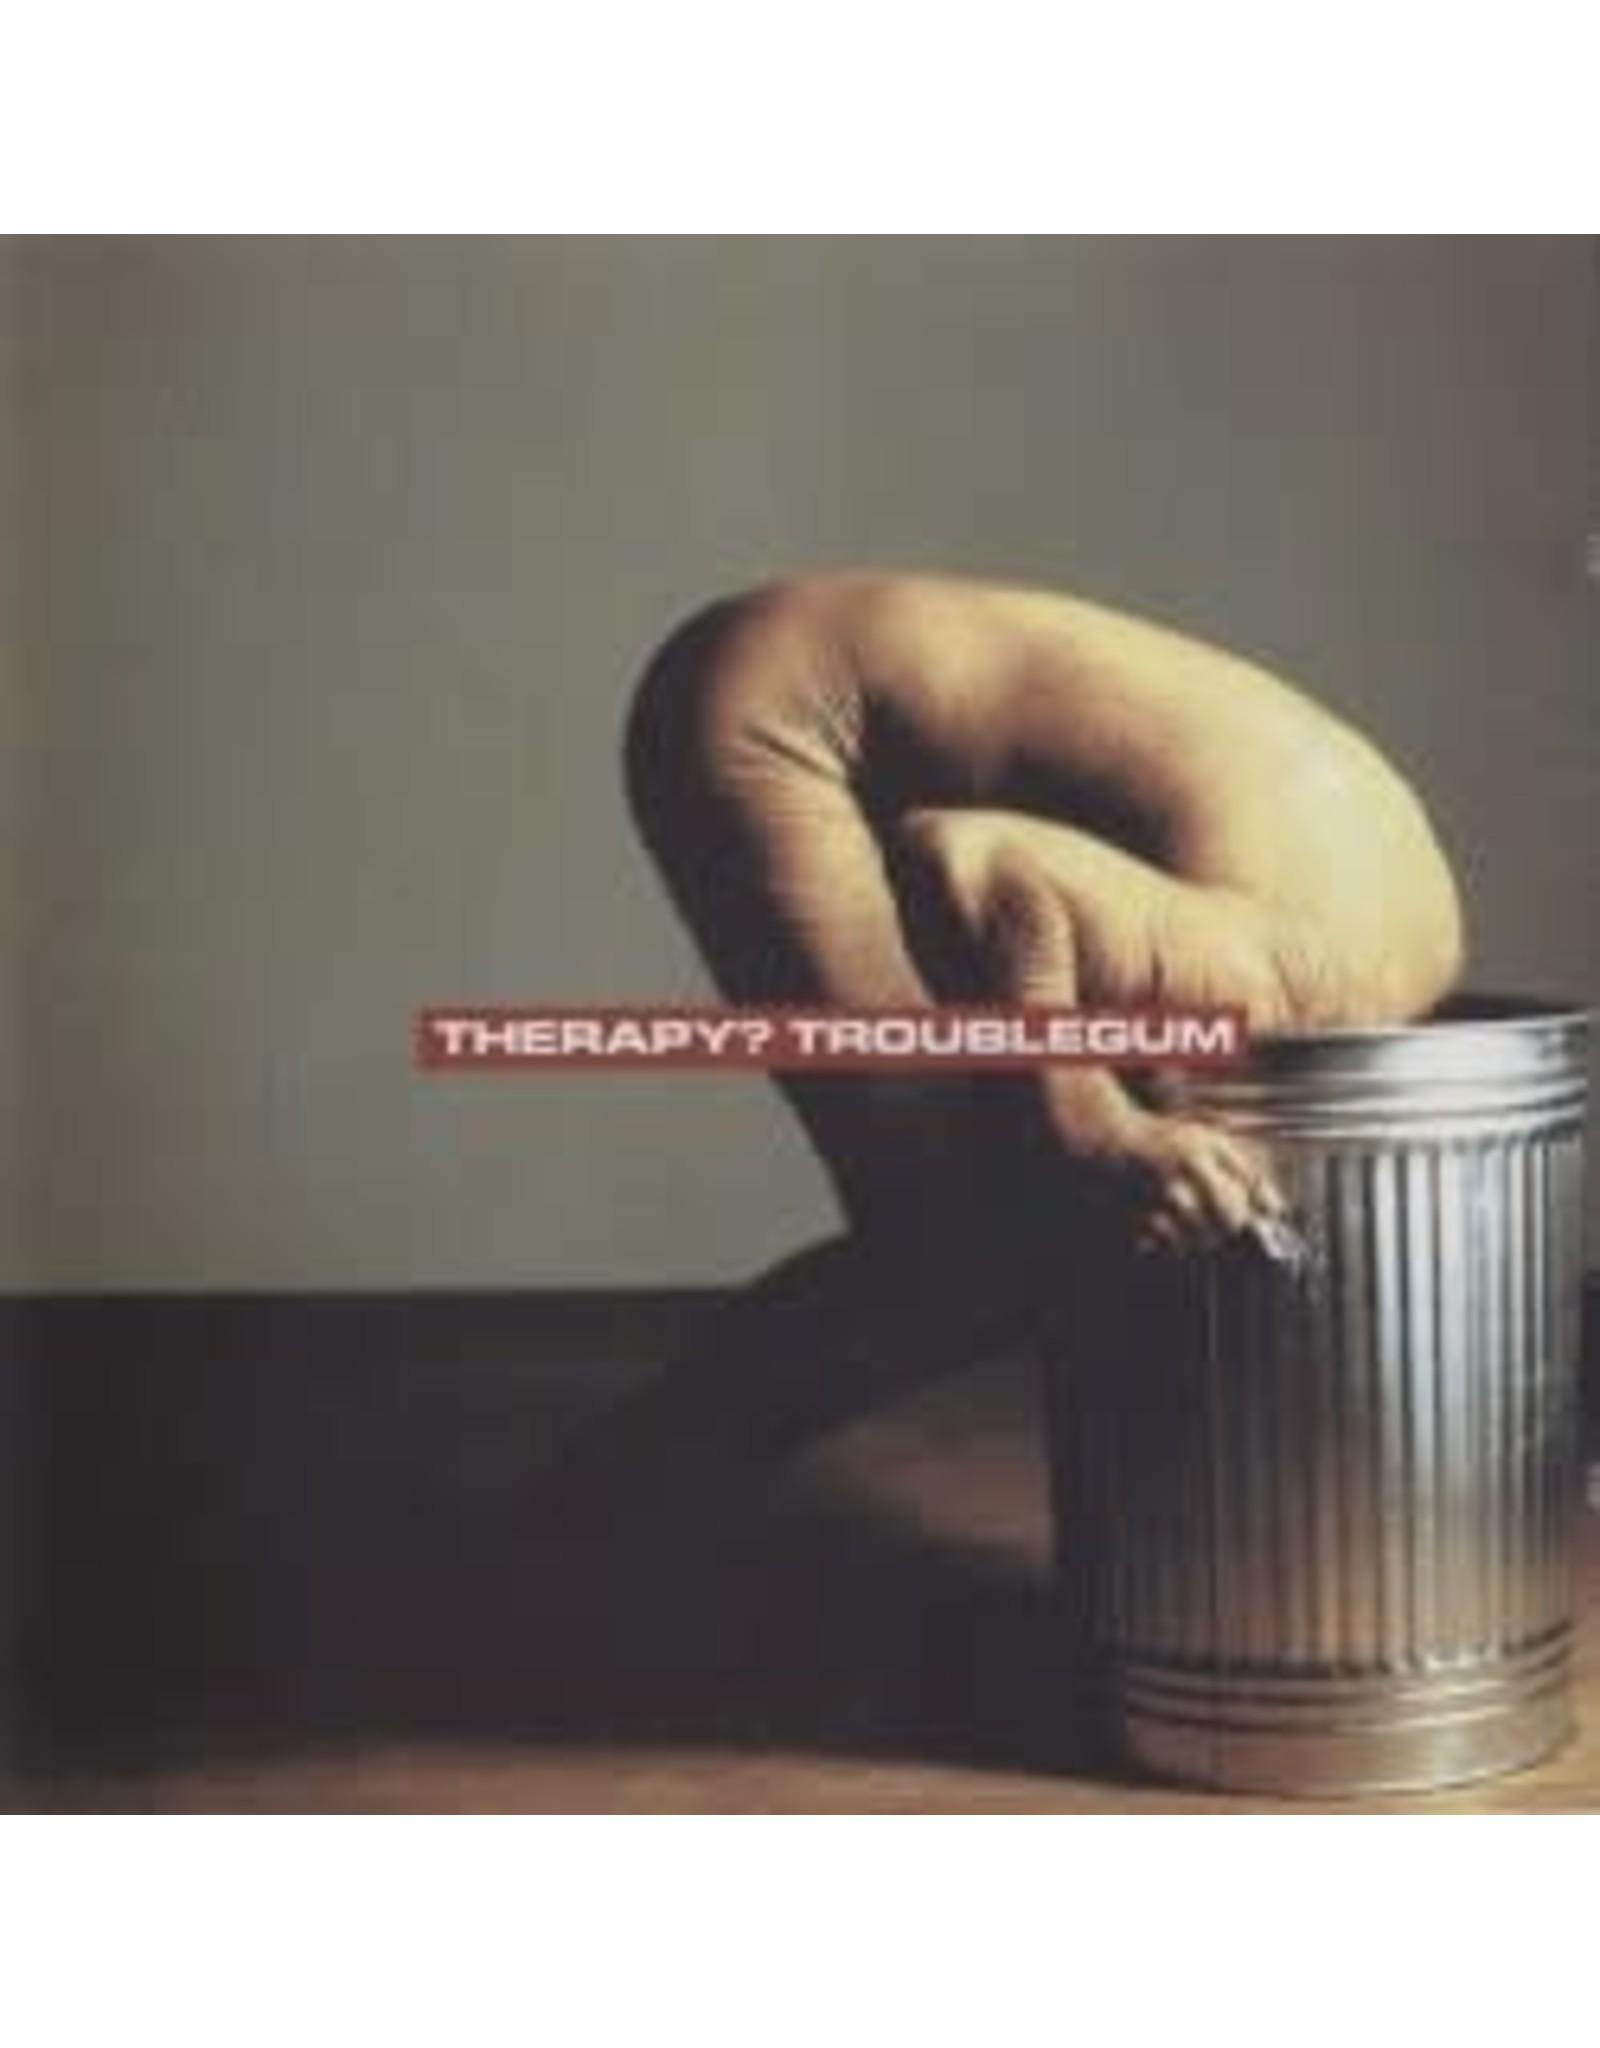 Therapy? - Troublegum  LP